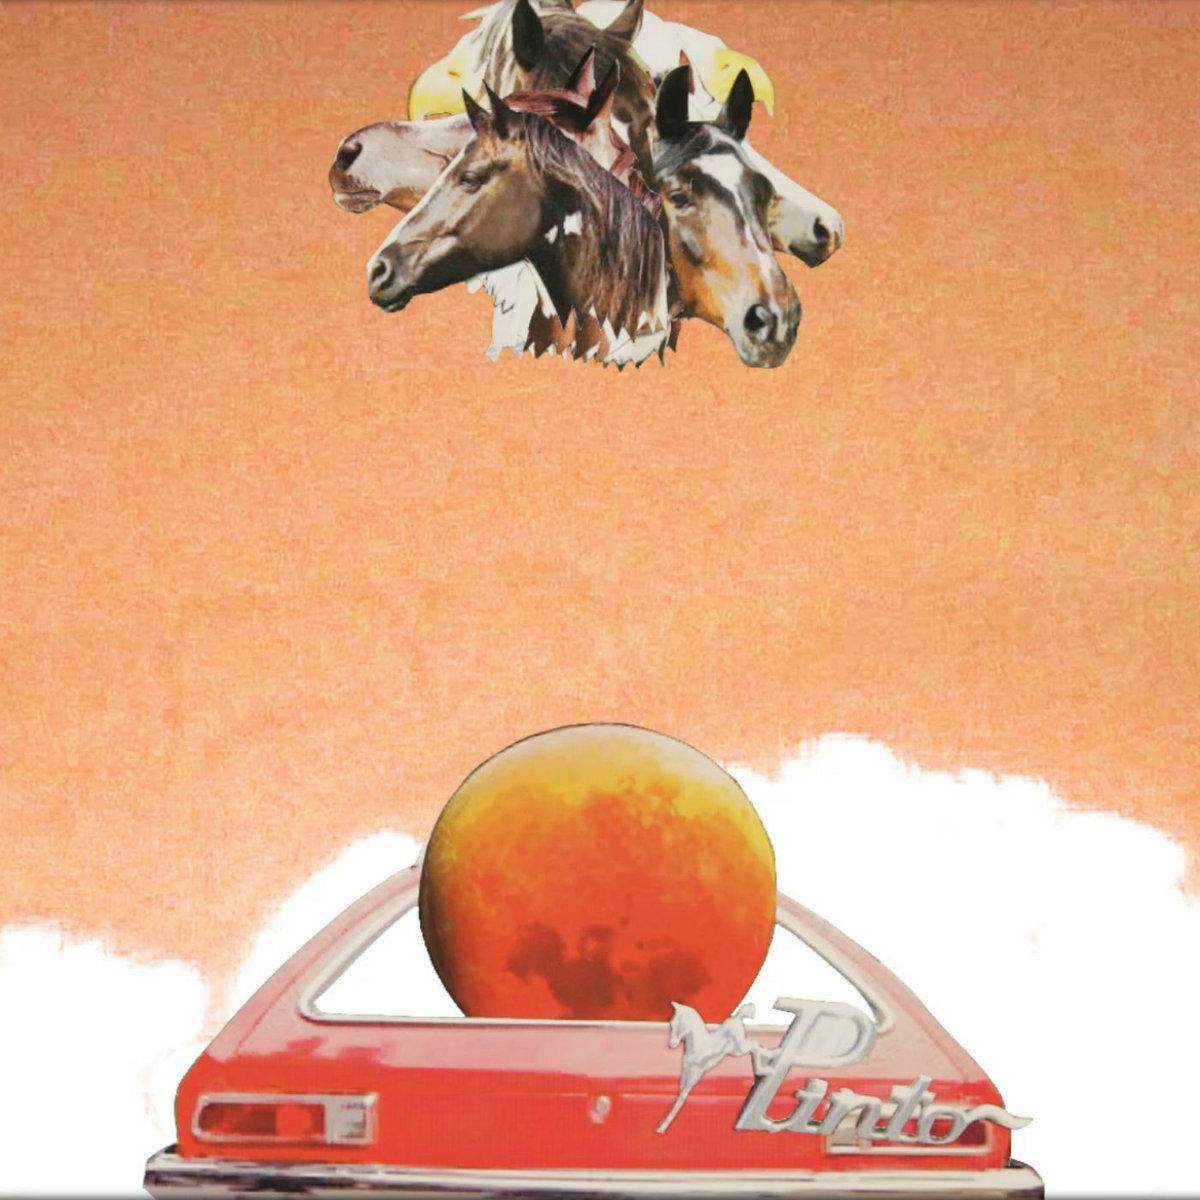 Scott Hirsch - No No (Flying Mojito Bros Refrito) | Flying